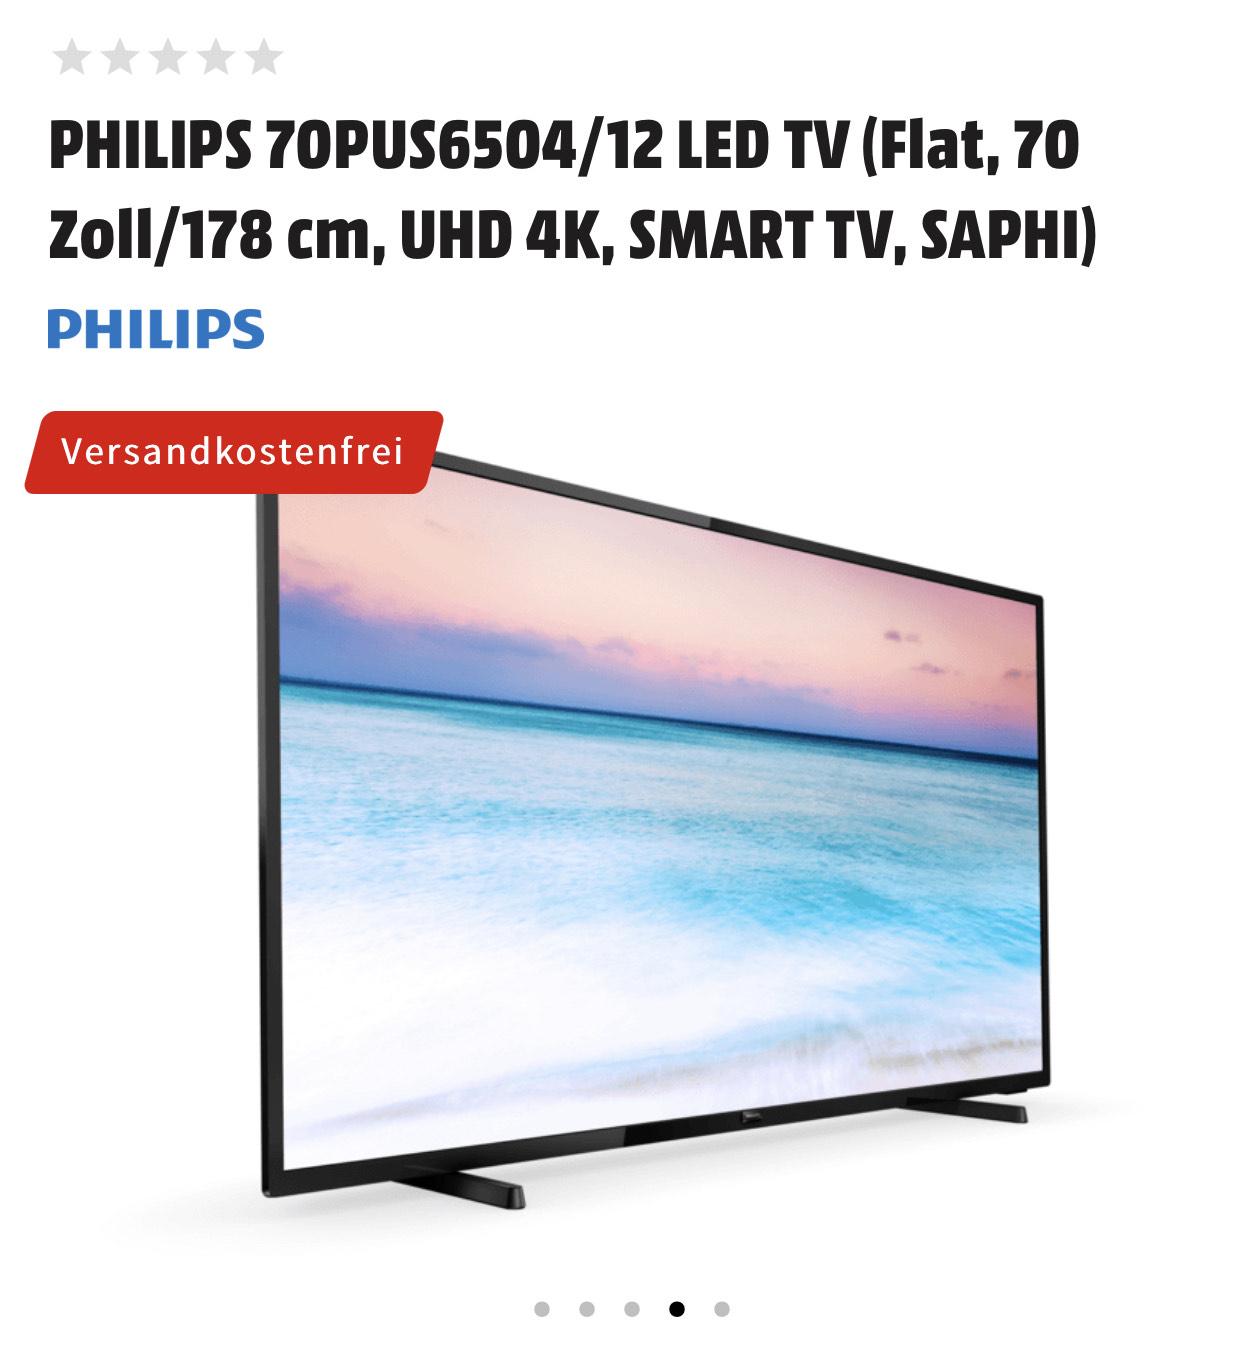 Philips PUS6504 70 Zoll, UHD 4K, Smart TV